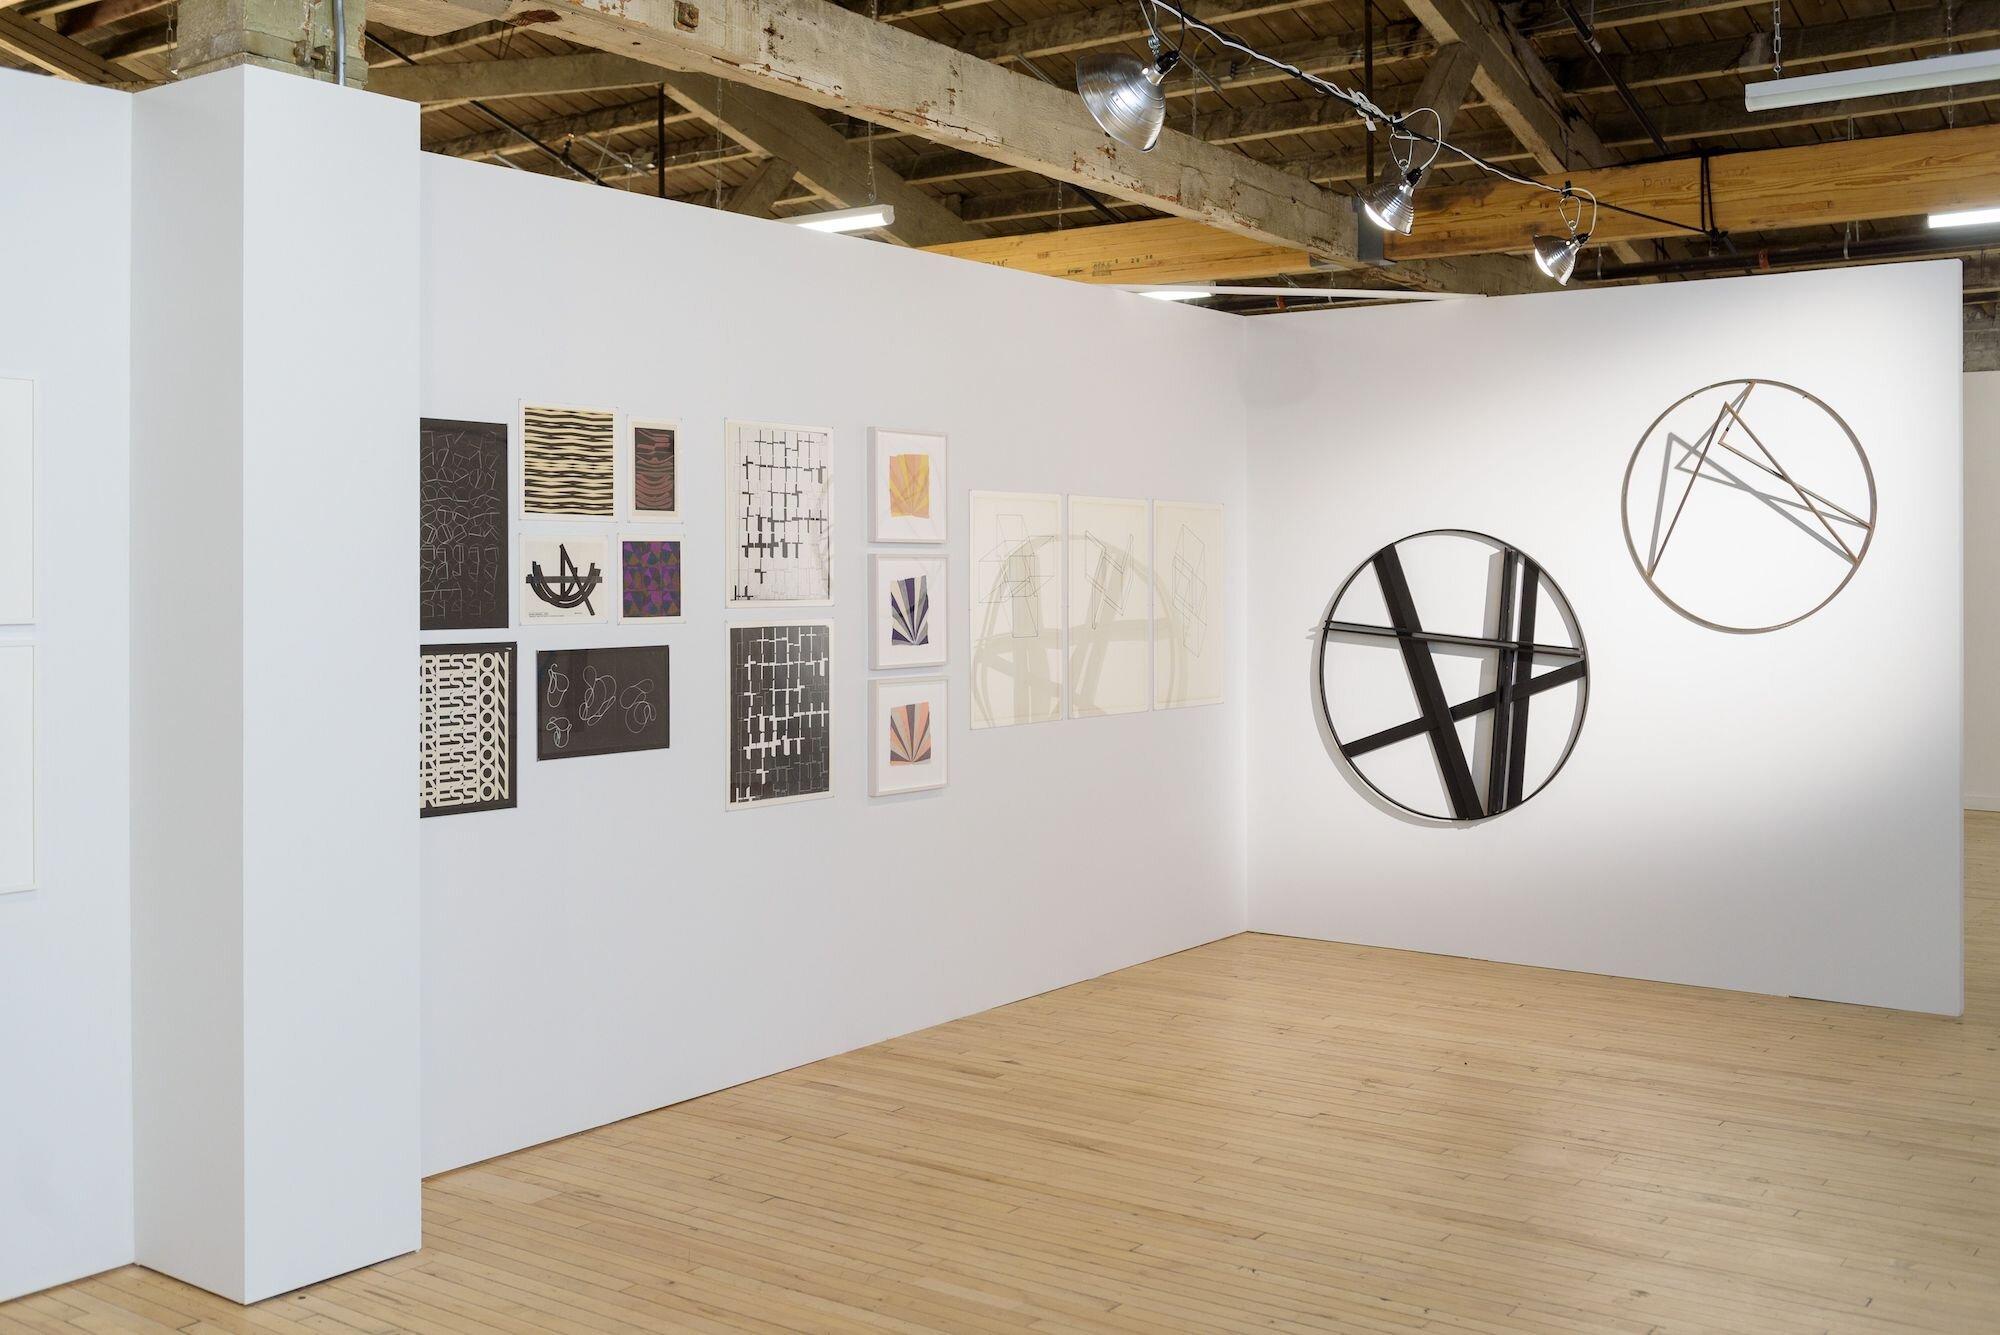 Two-Suns-LMCC-Arts-Center-4-1.jpg